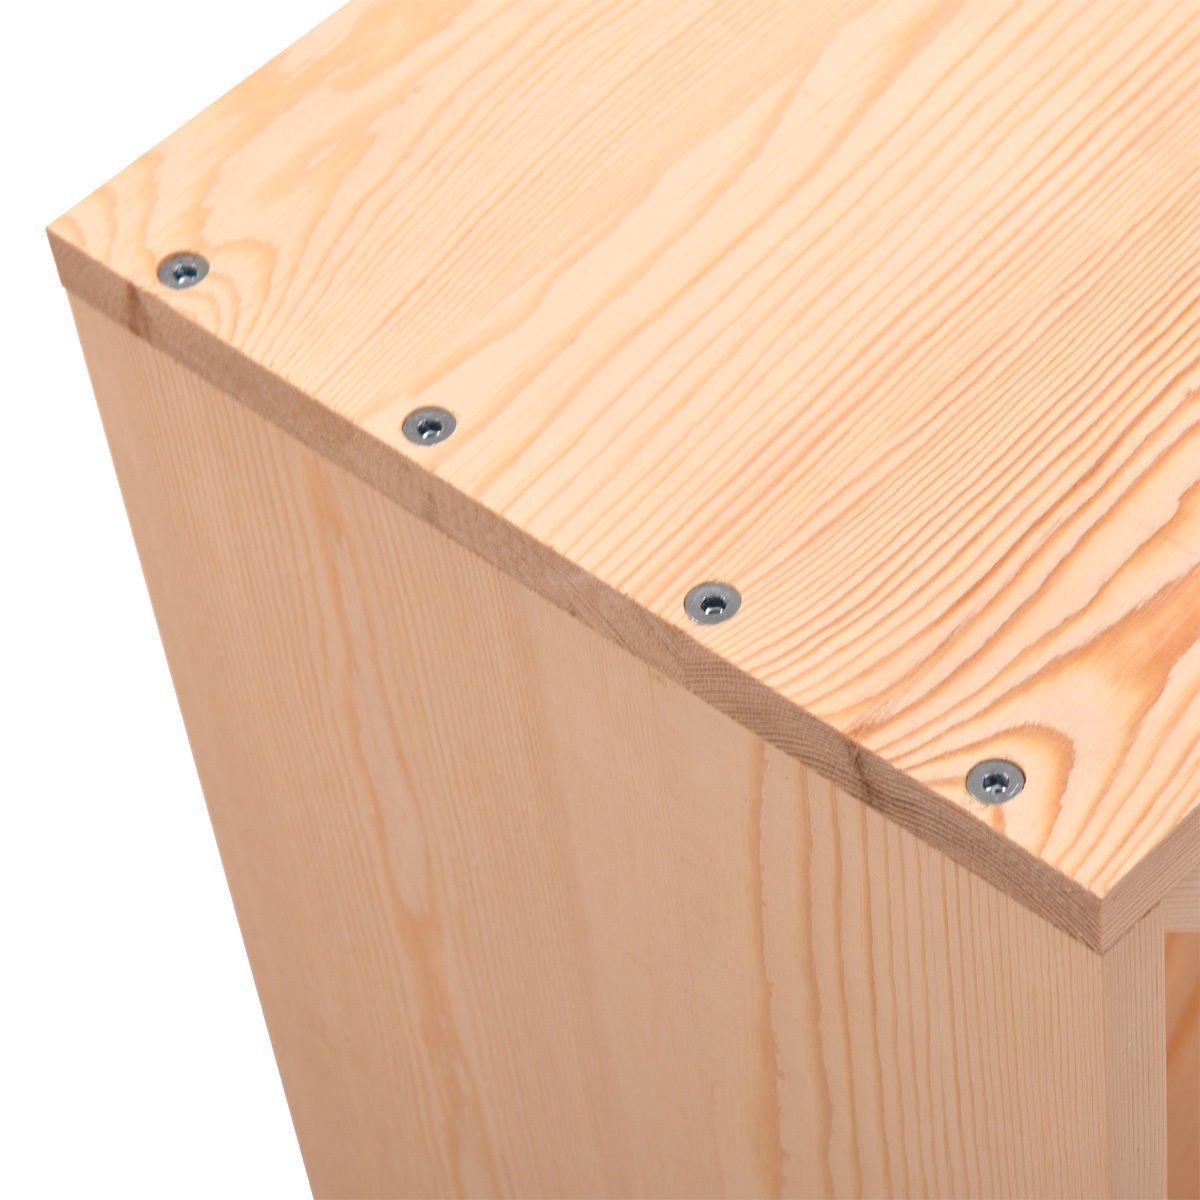 Tobbi Tabletop 24 Bottle Wine Rack Wood Stackable Storage Cube Display Shelves Kitchen